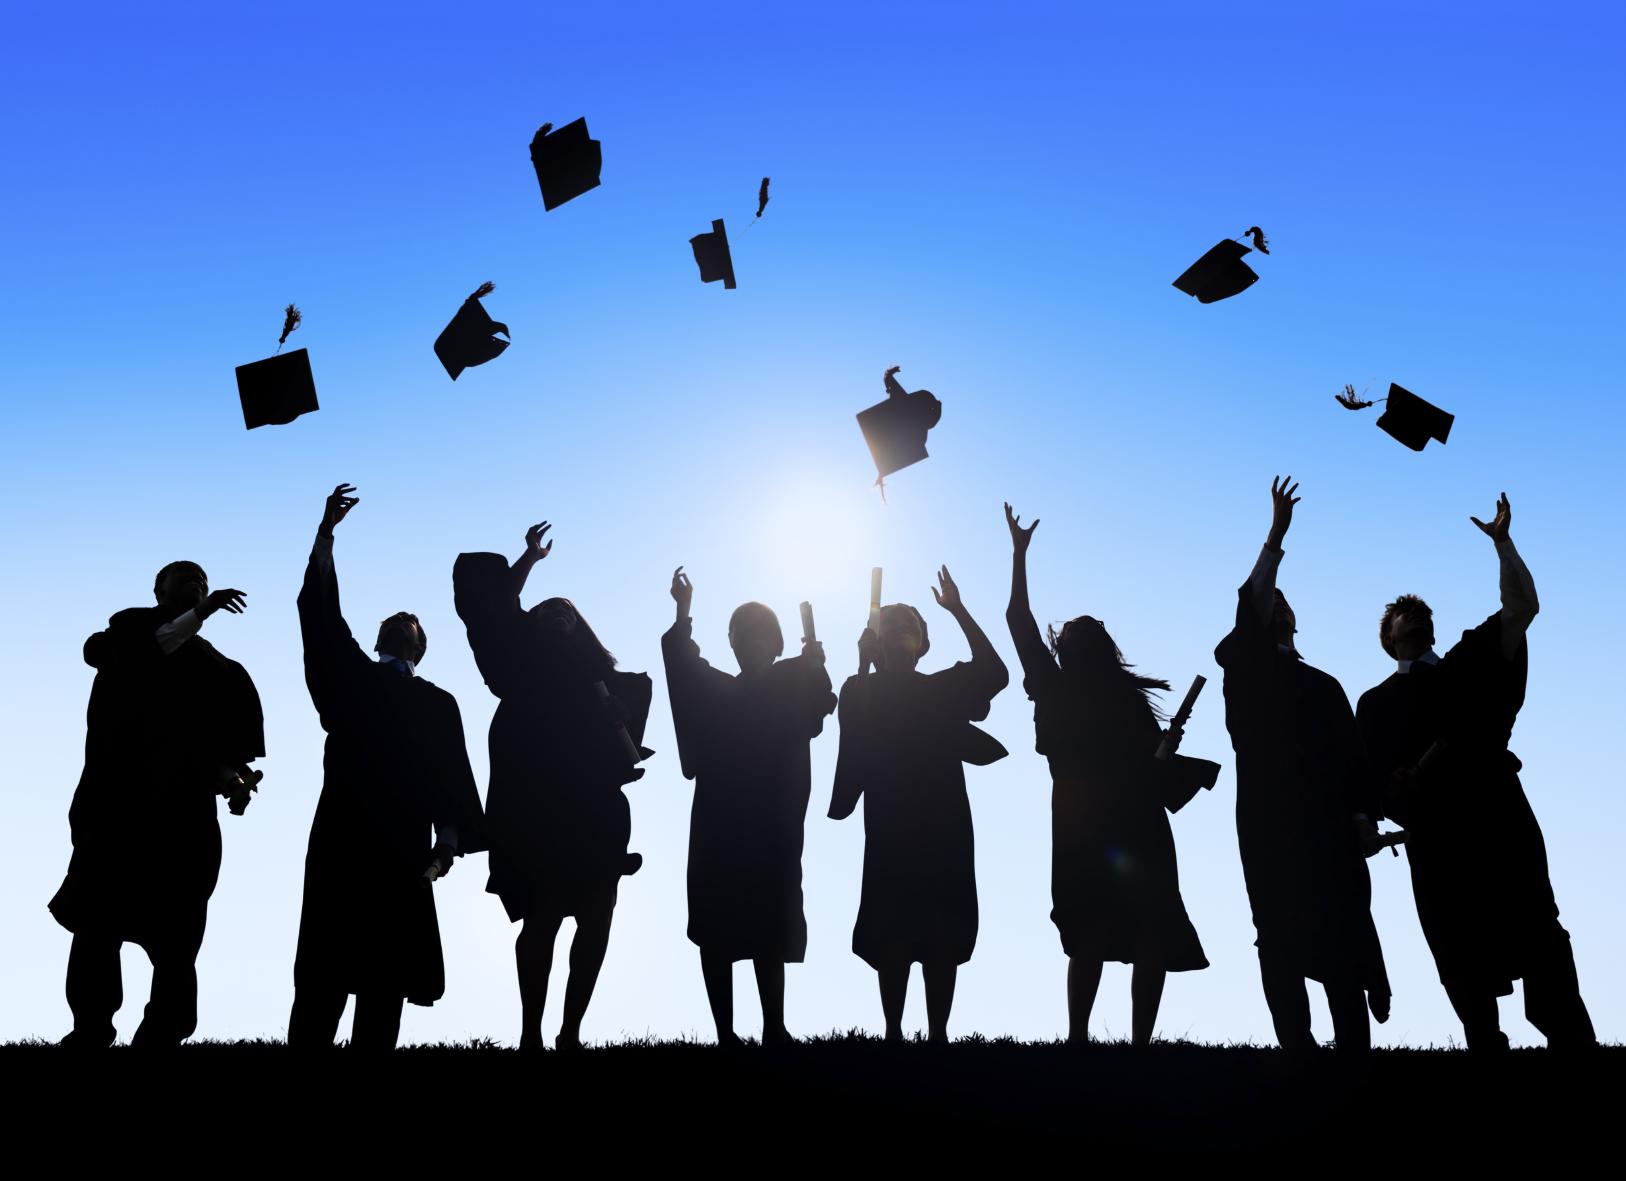 Students Celebrating Graduation Throwing Caps